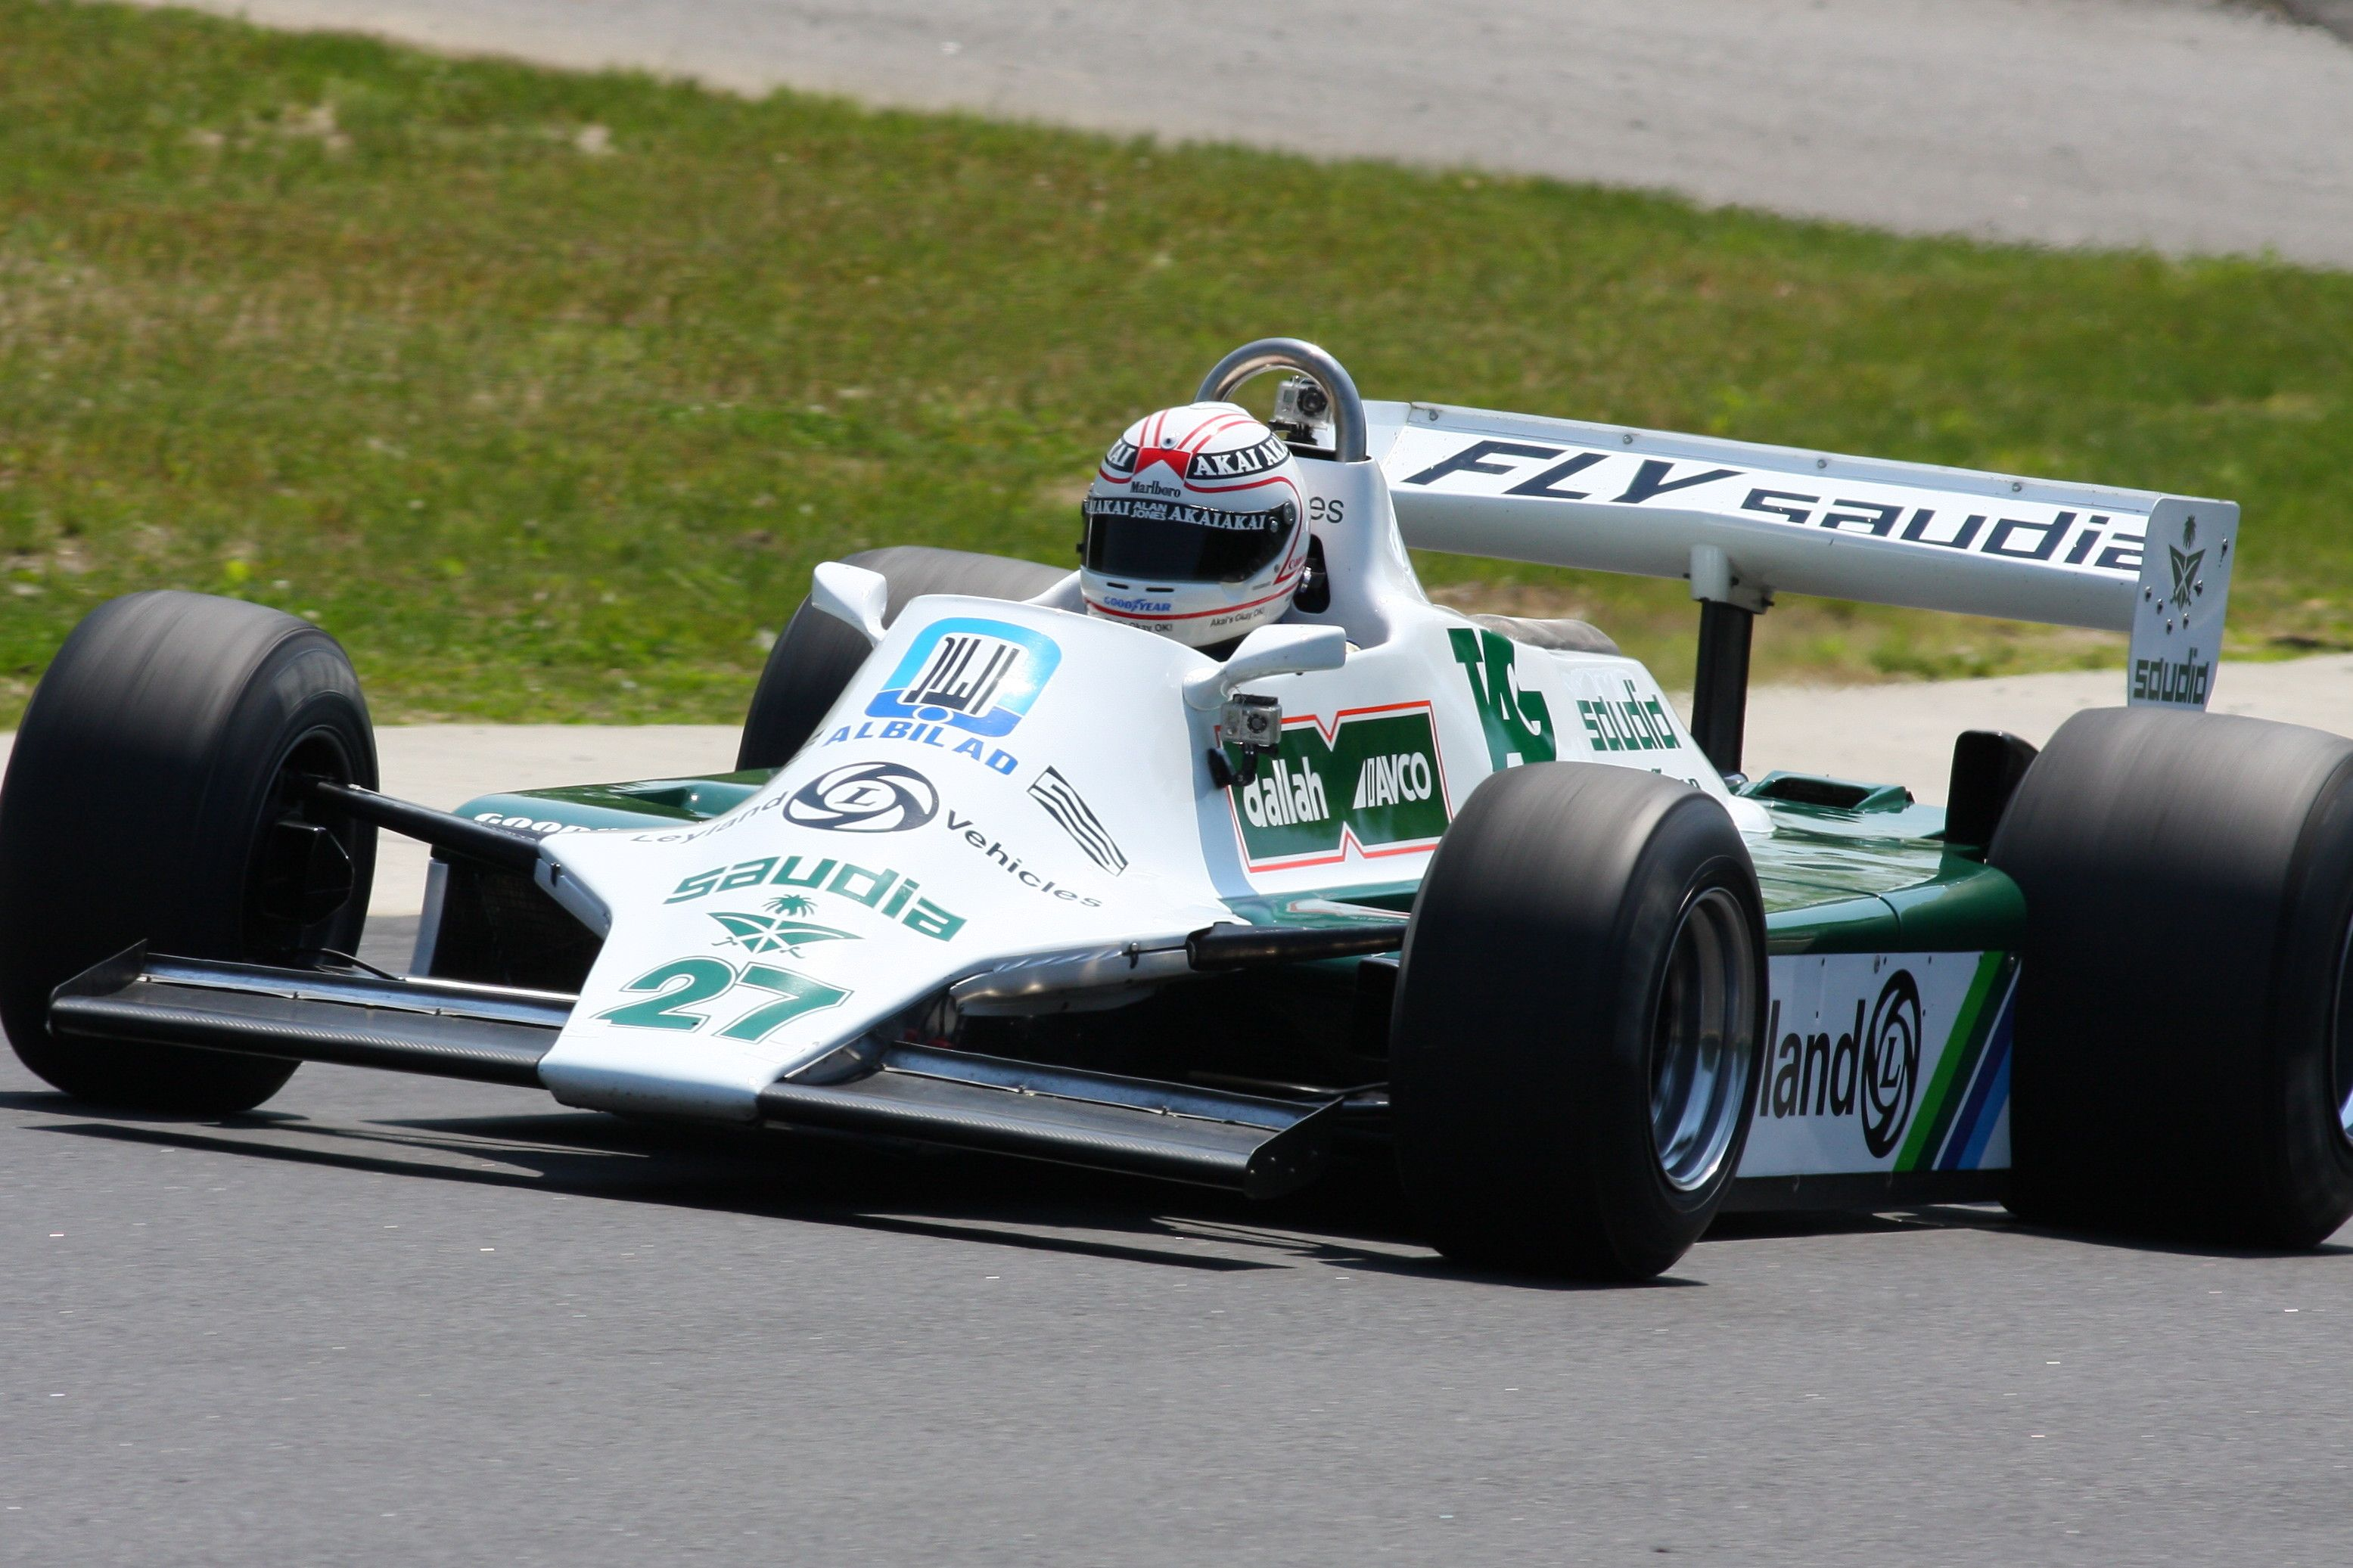 Williams Fw07 Alan Jones 1978 Williams F1 Formula 1 Car Formula Racing